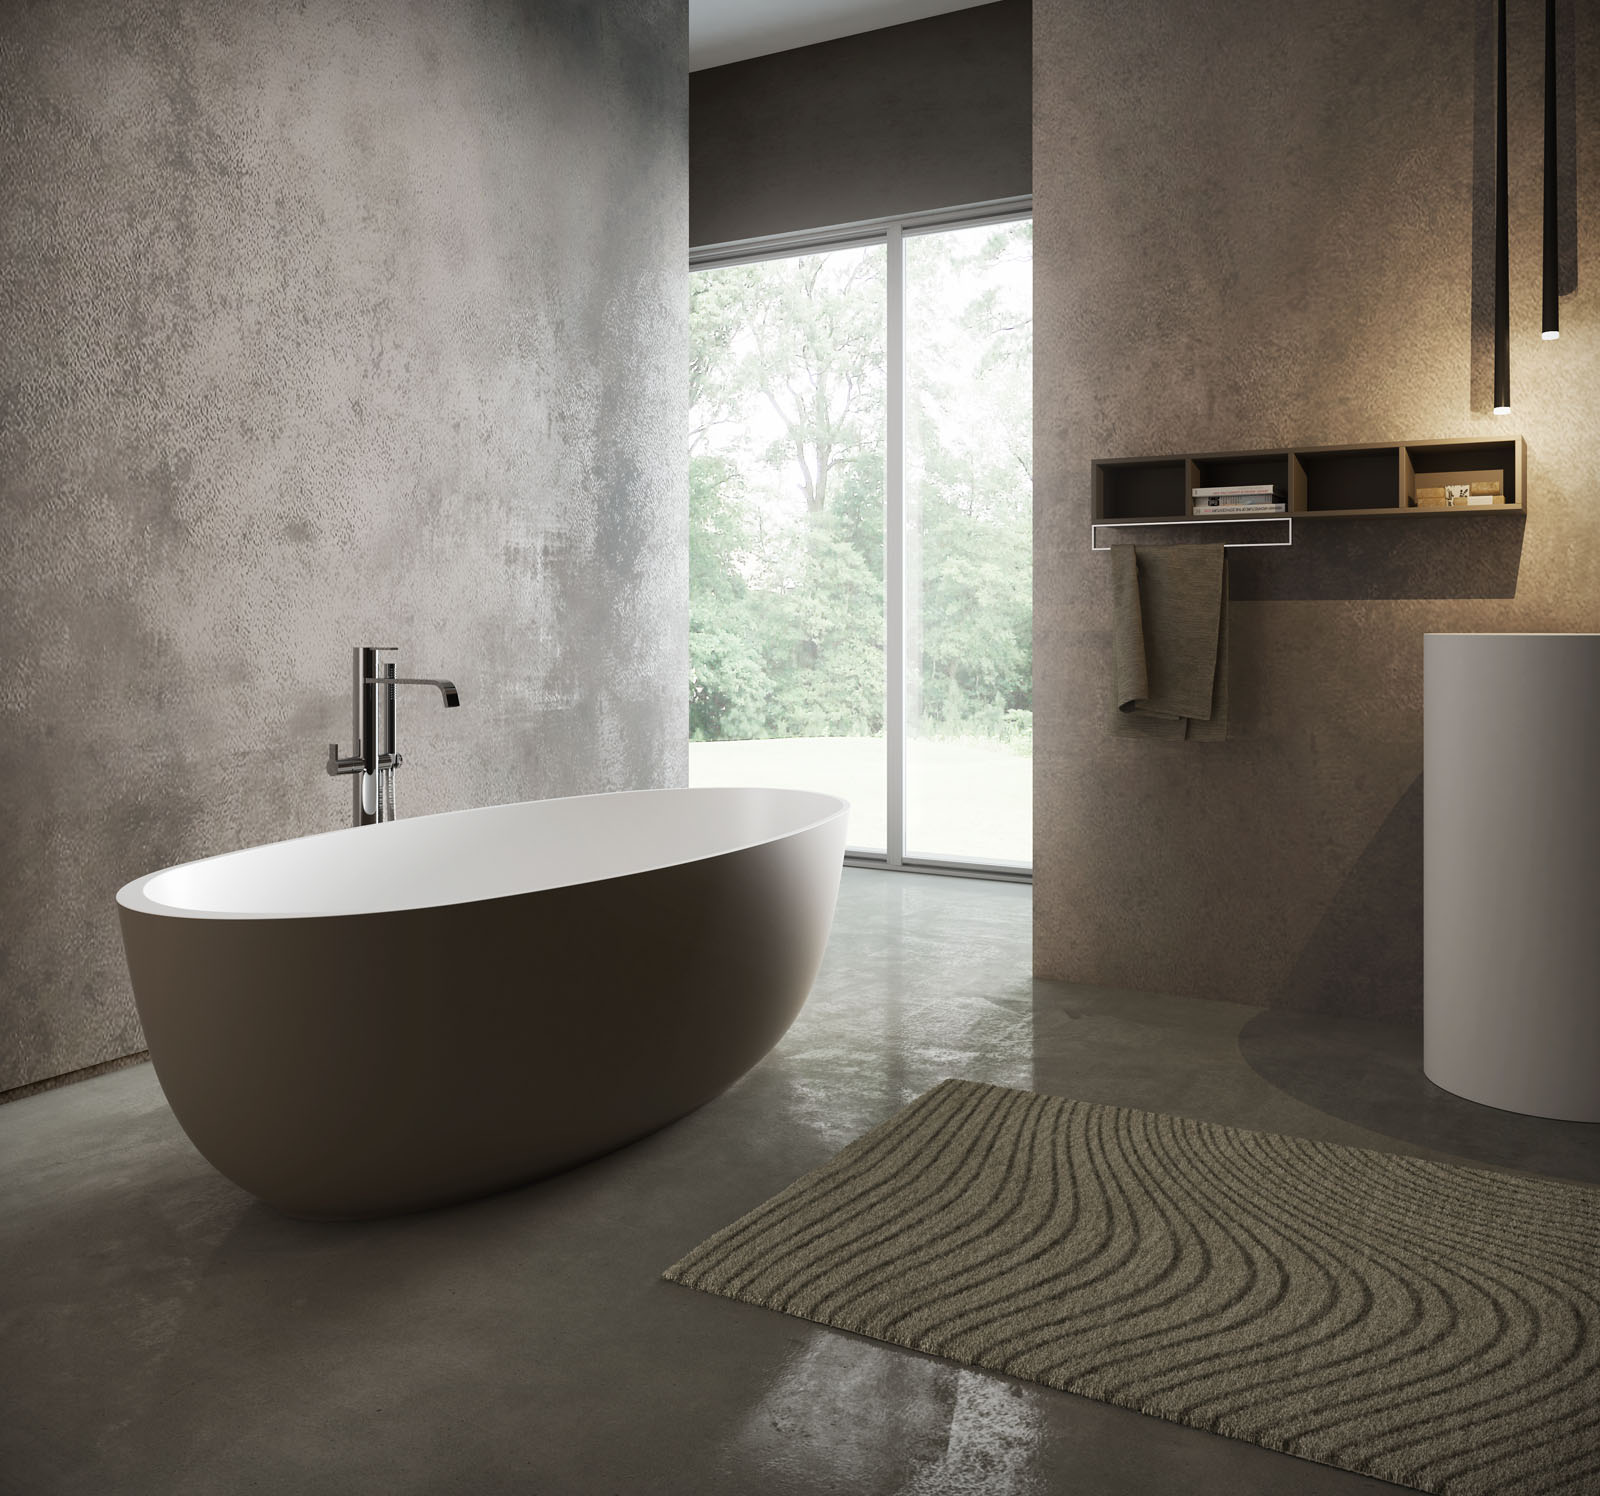 Round vasca da bagno moderna disenia for Vasca da bagno moderna